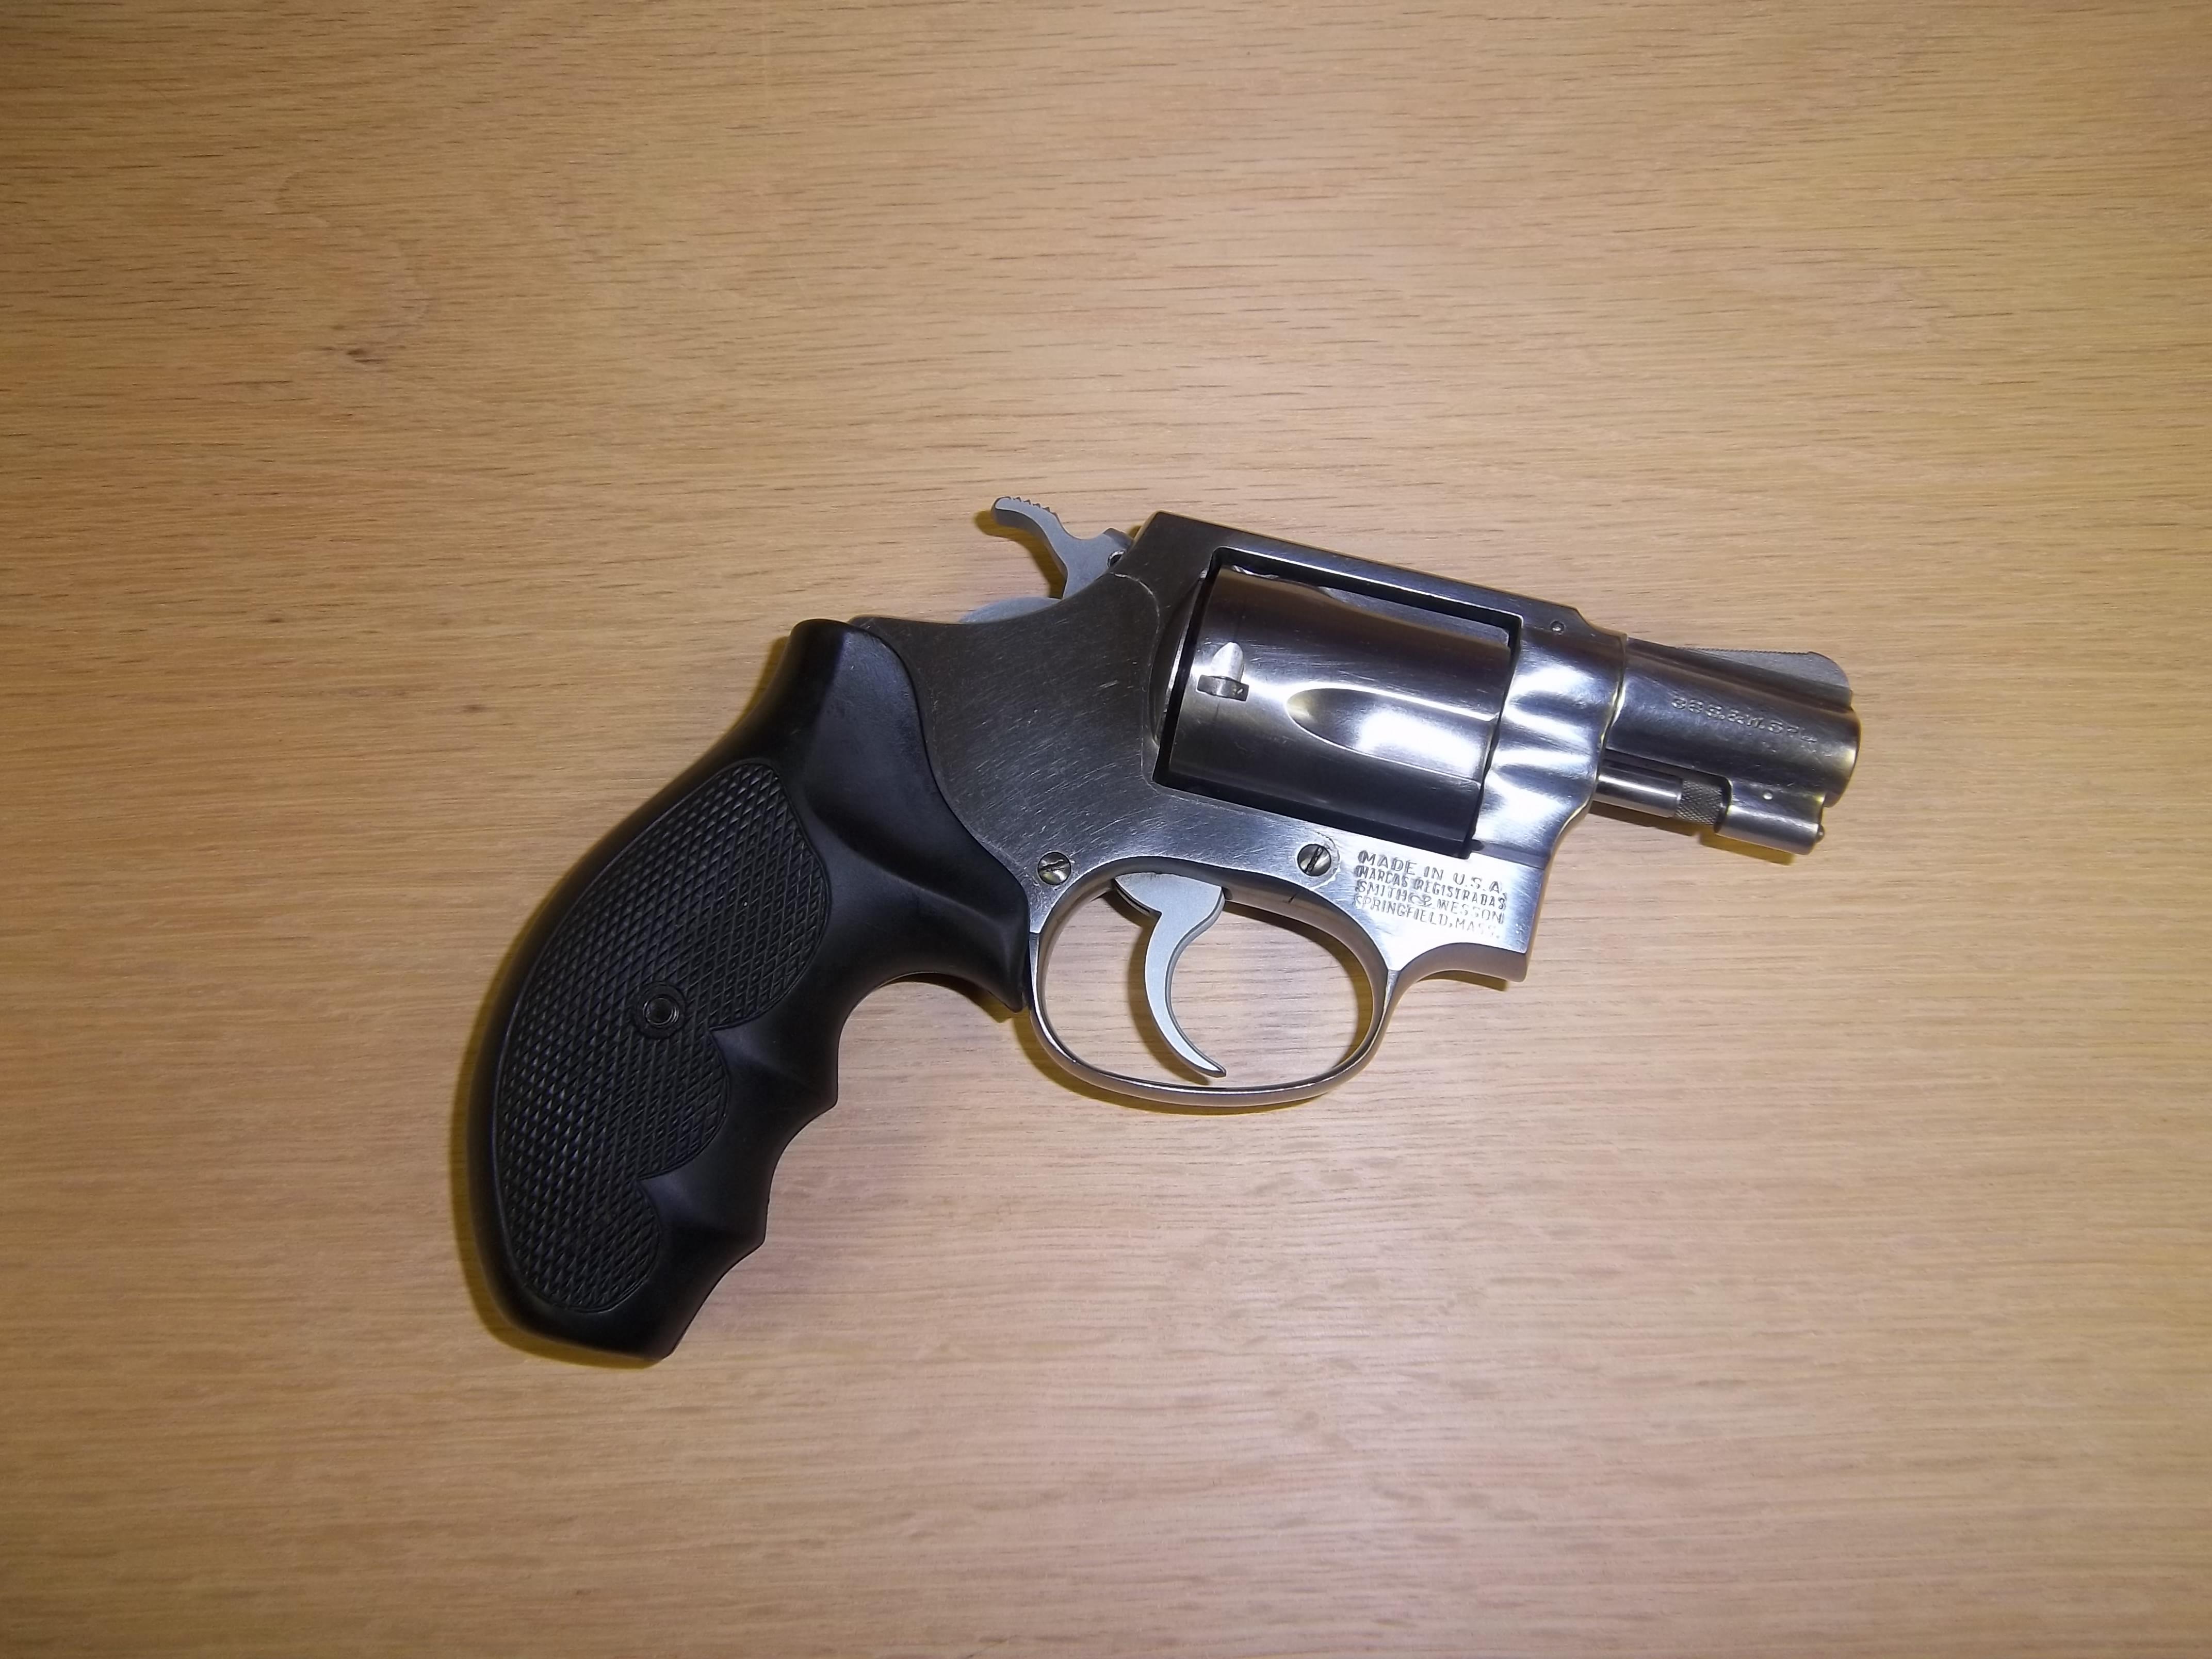 Dating s&w model 60 revolver